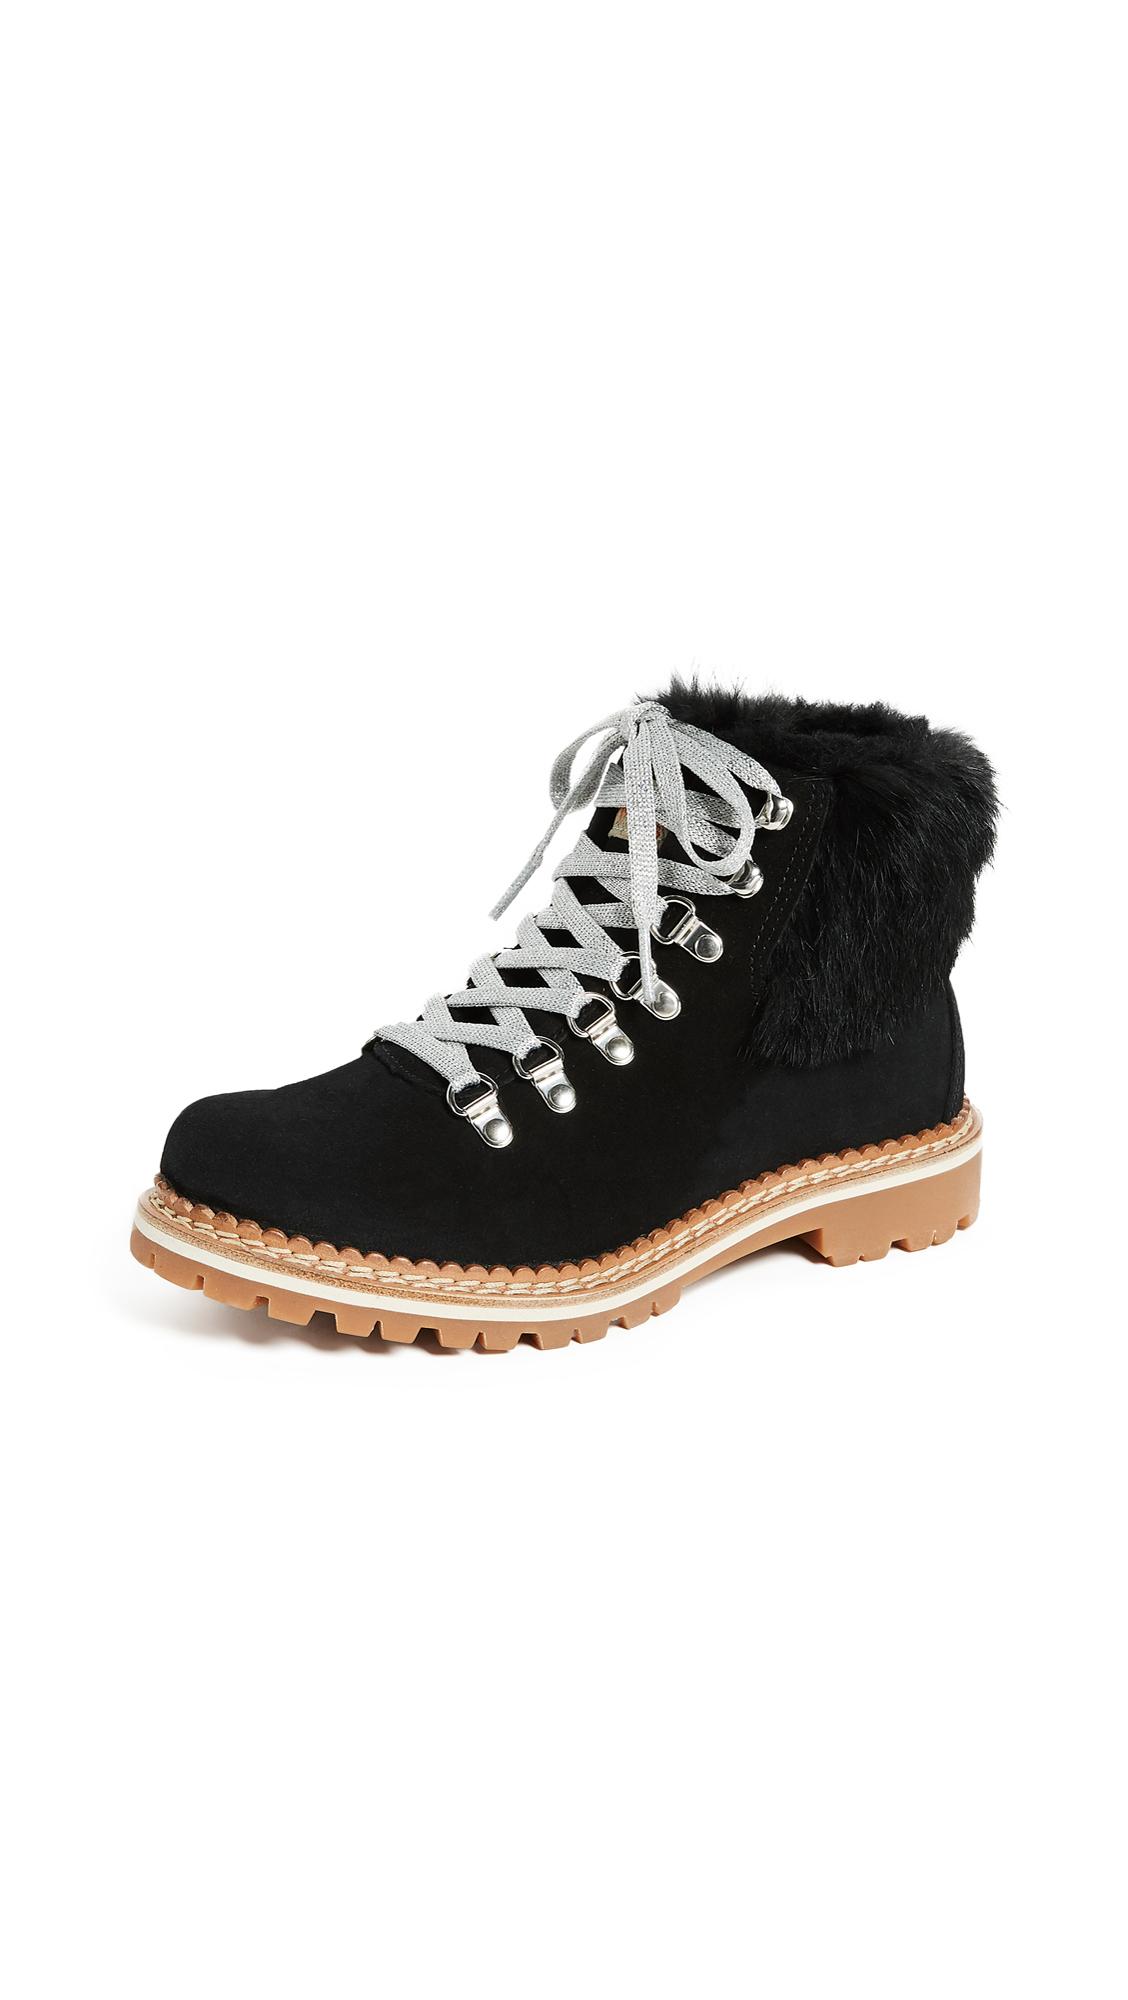 Montelliana Camelia Hiker Boots - Black/Black